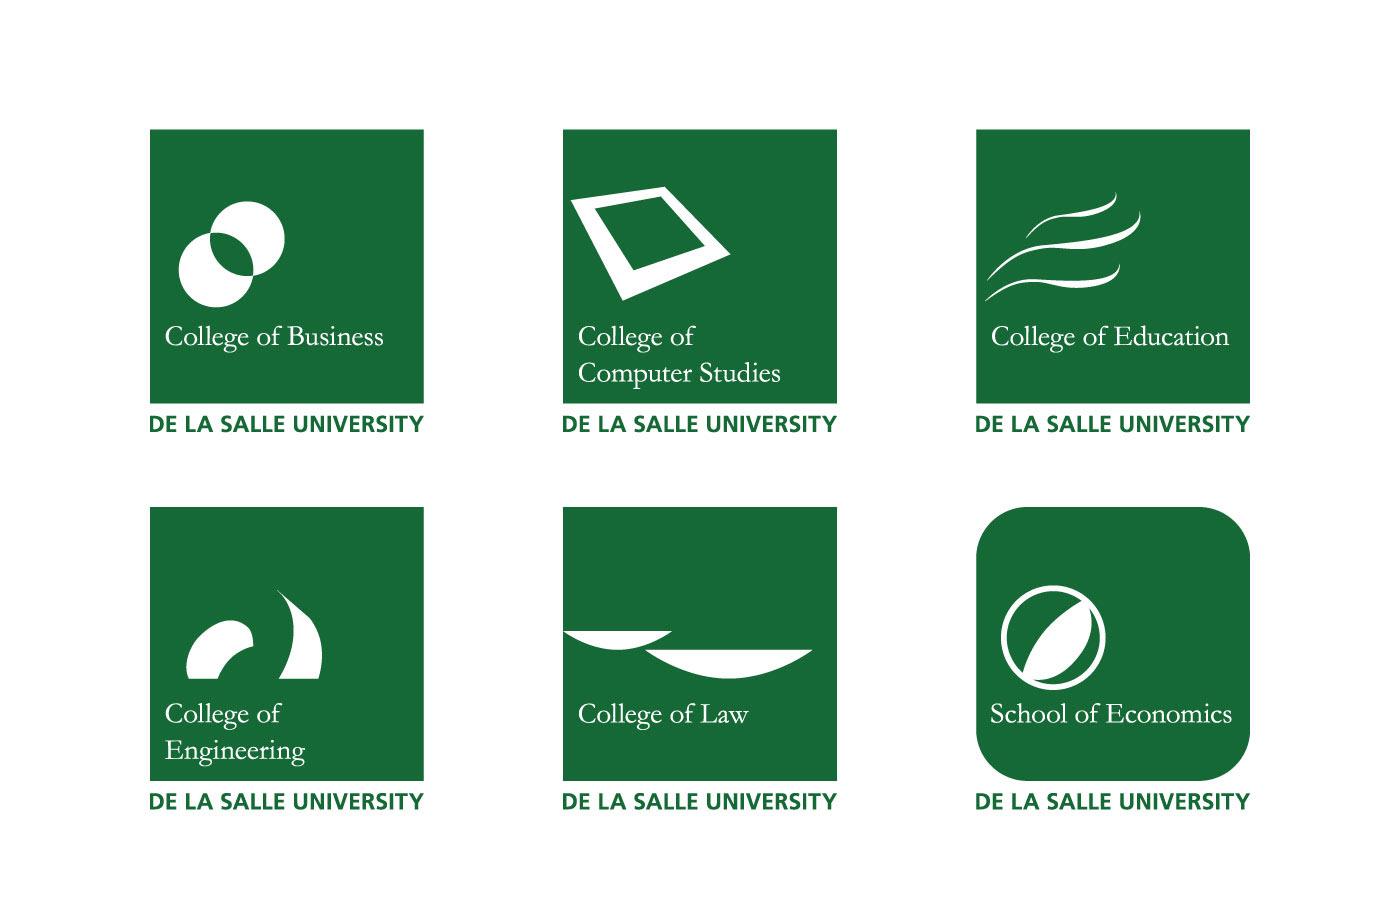 luis de vera graphic designer dlsu college logos